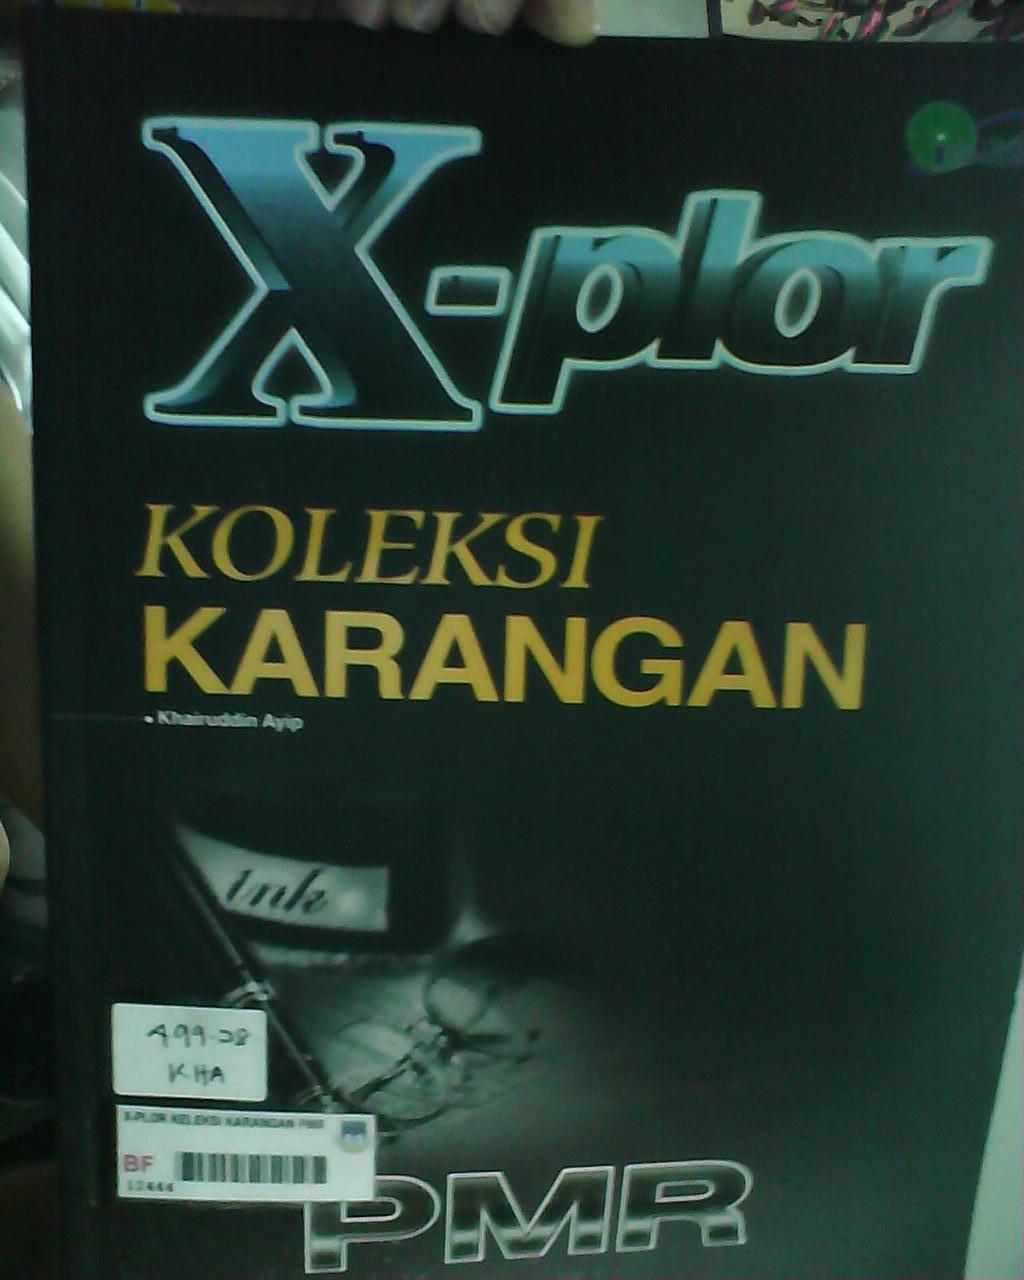 Plor PMR Koleksi Karangan - Info Didik Sdn Bhd